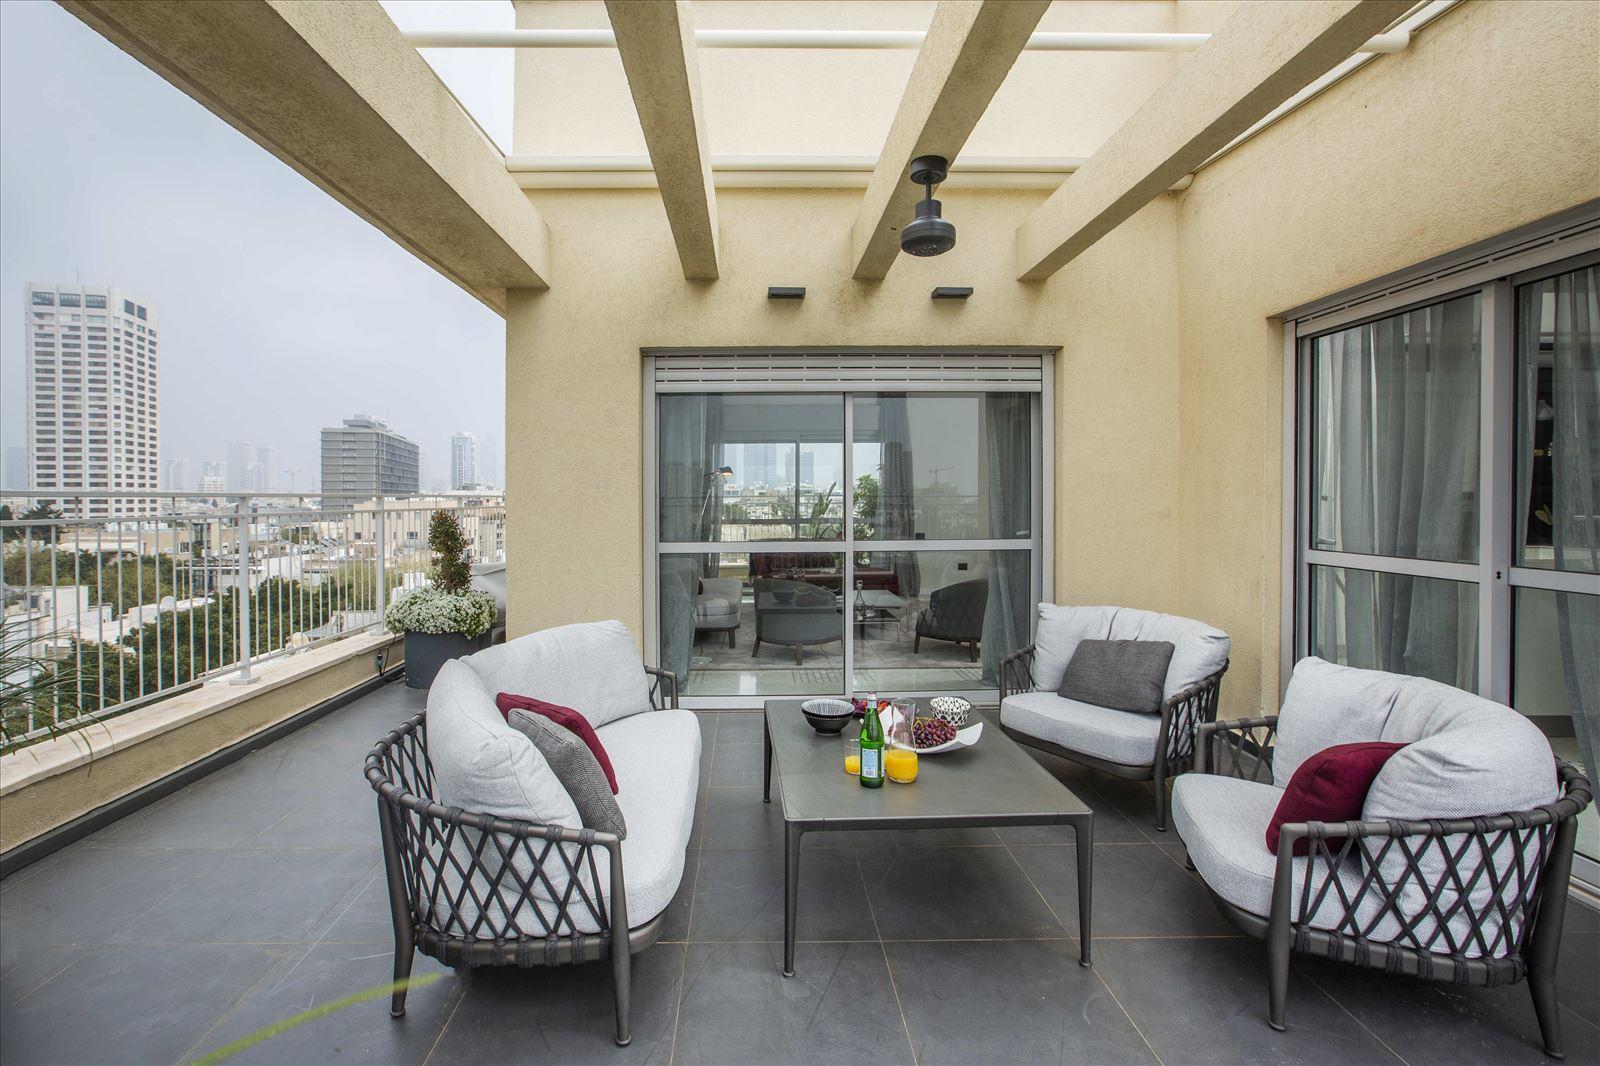 Tel Aviv apartment in Parisian aroma תאורת חוץ במרפסת על ידי קמחי תאורה